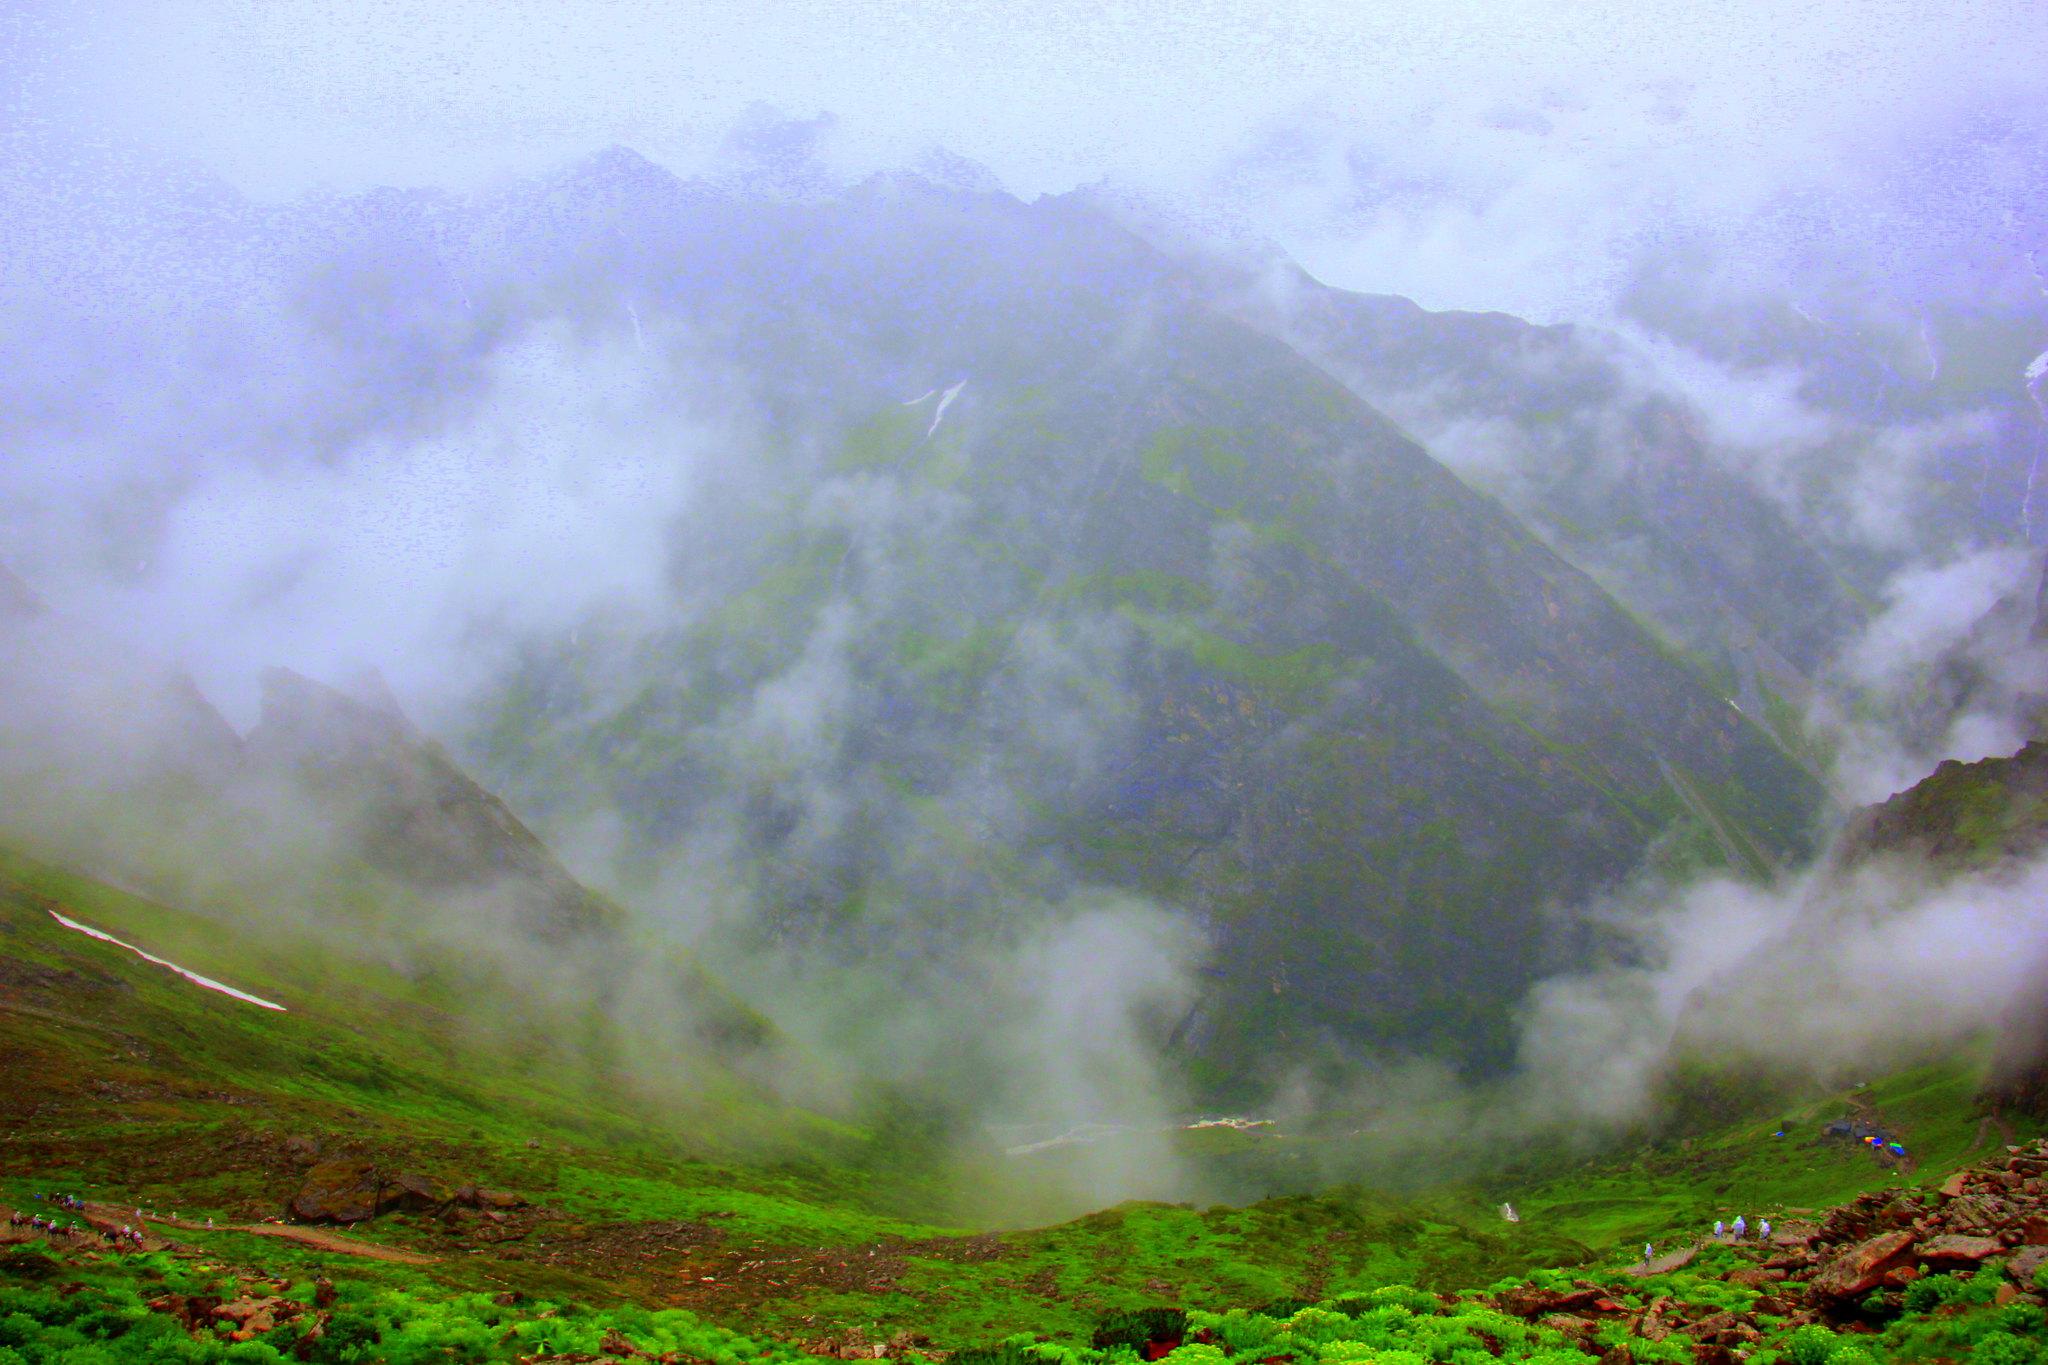 The trek to Hemkund Sahib offers lovely views